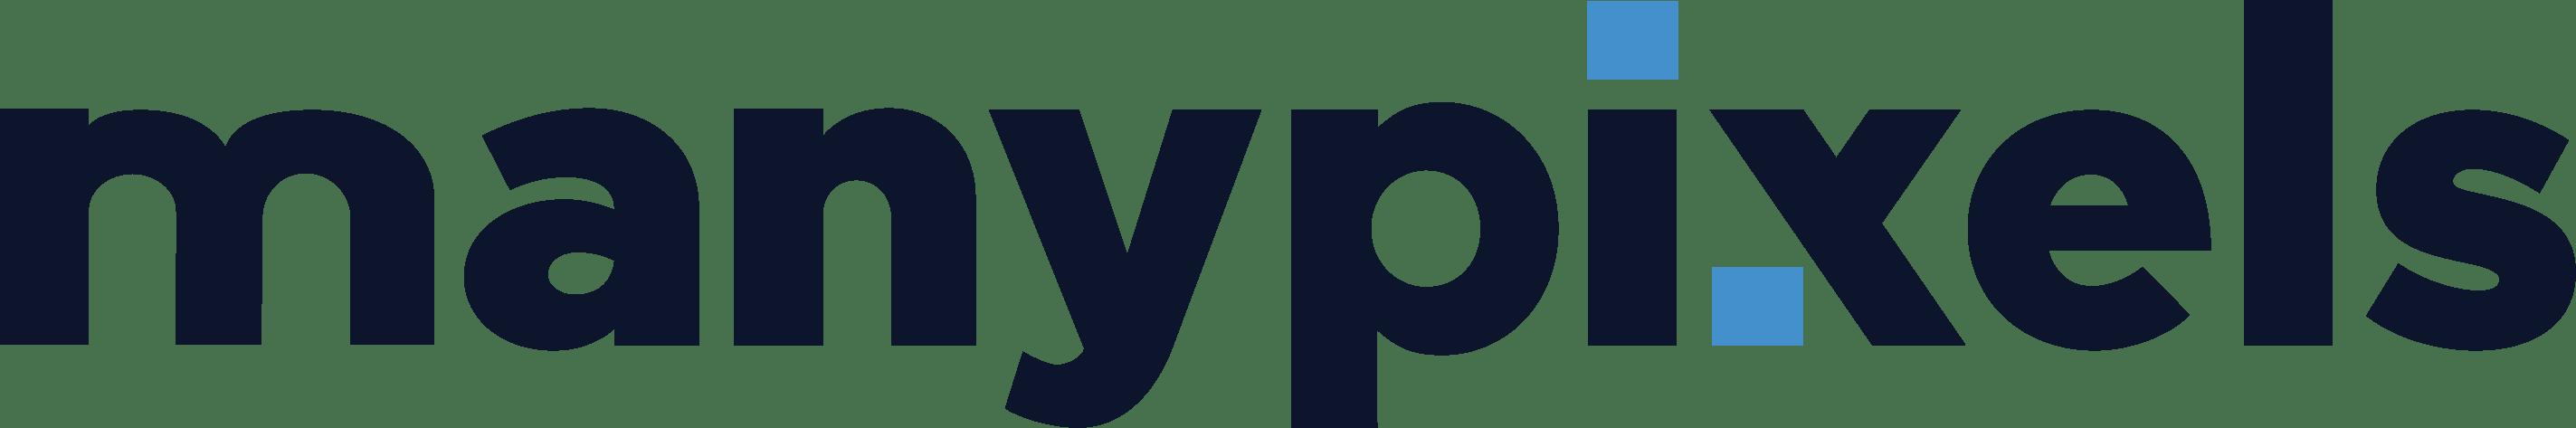 manypixels review logo unlimited design services